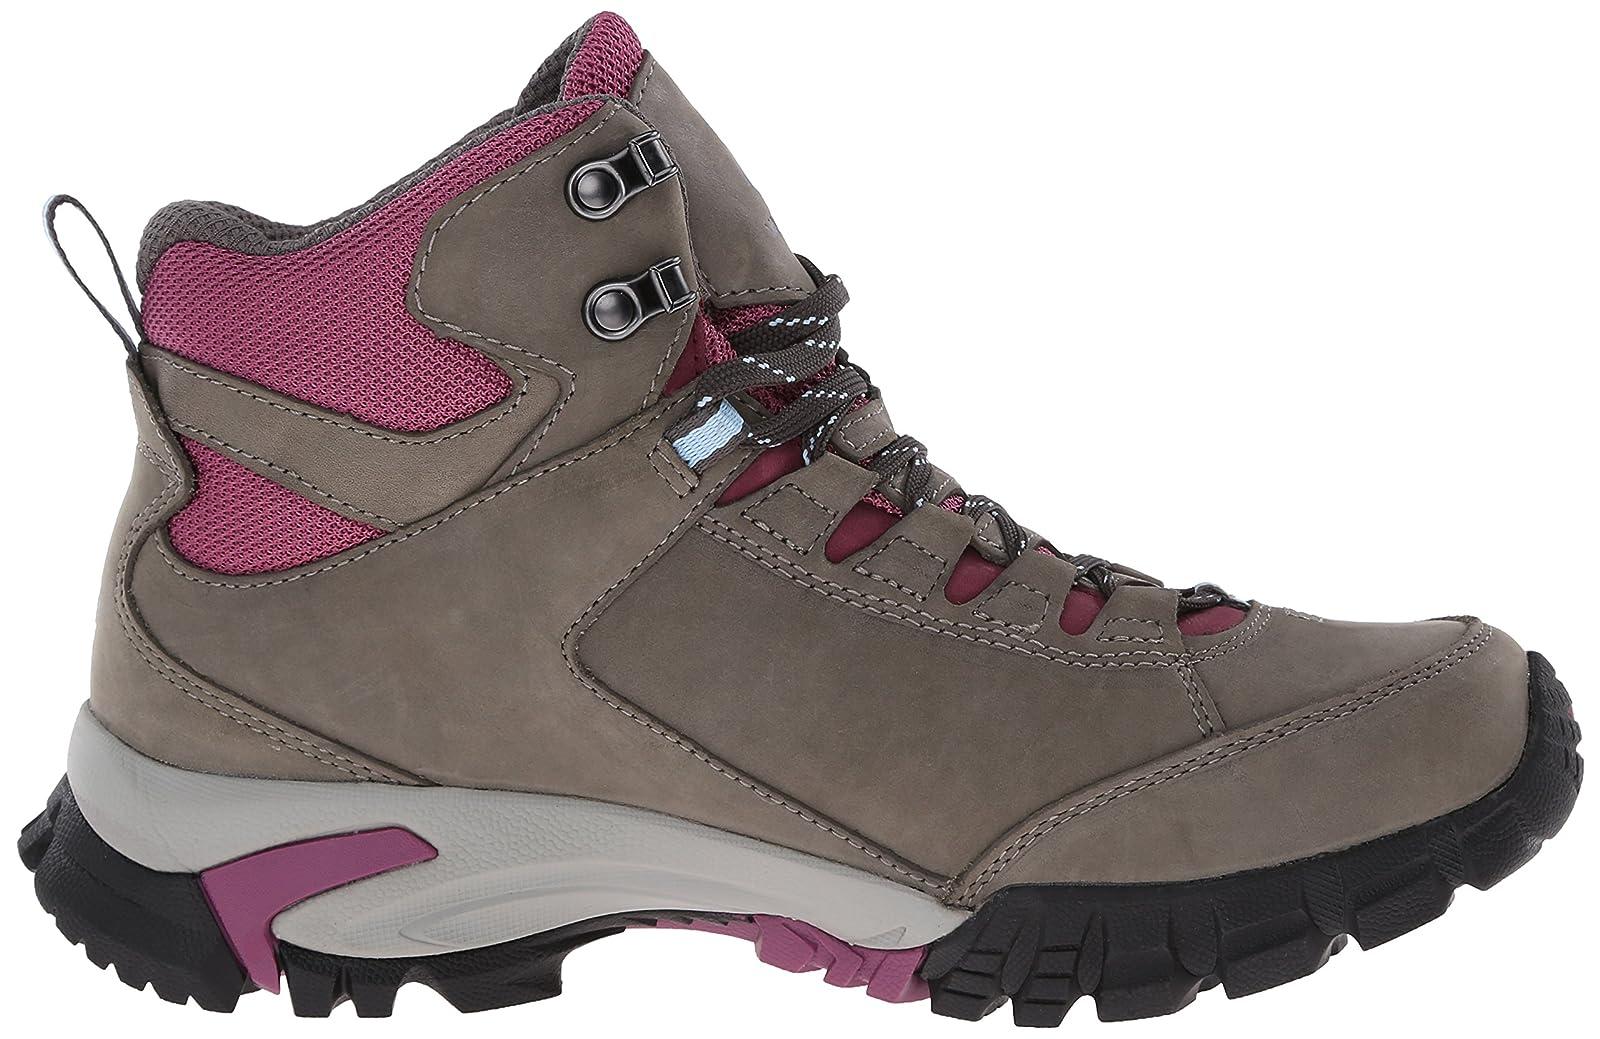 Vasque Women's Talus Trek UltraDry Hiking Boot US - 5